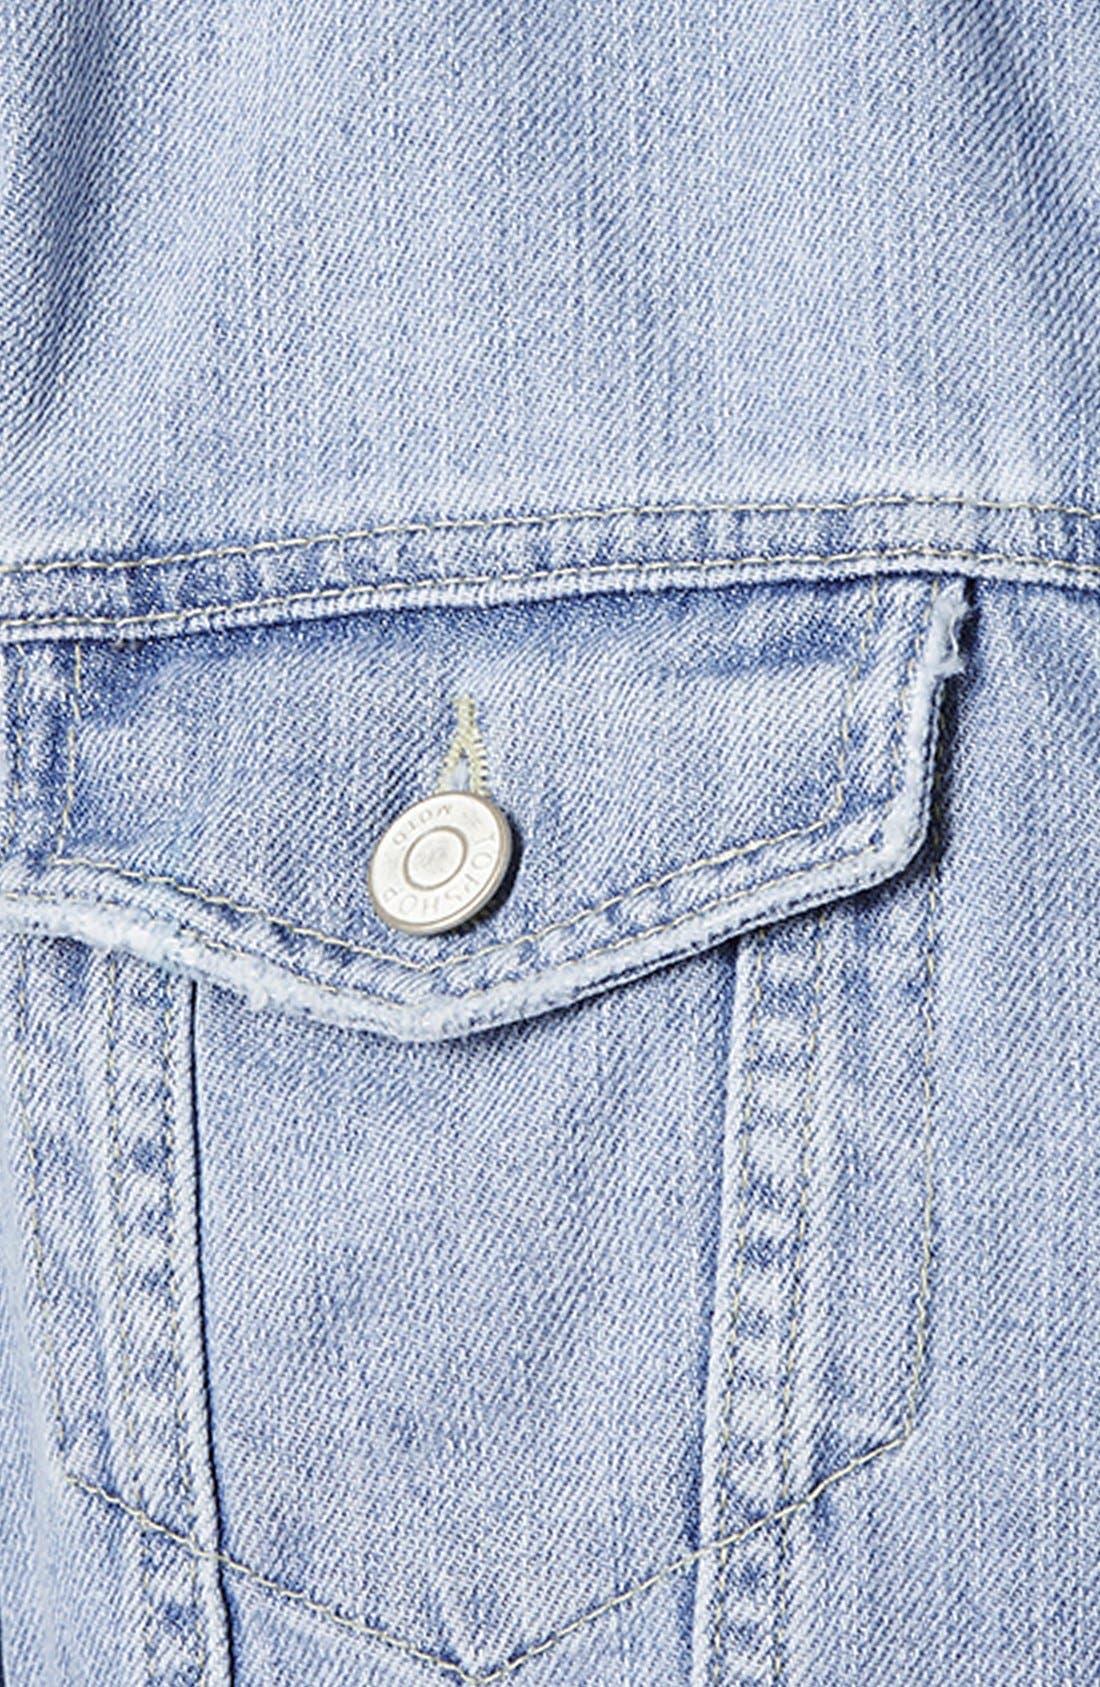 Alternate Image 4  - Topshop Moto Crop Denim Jacket